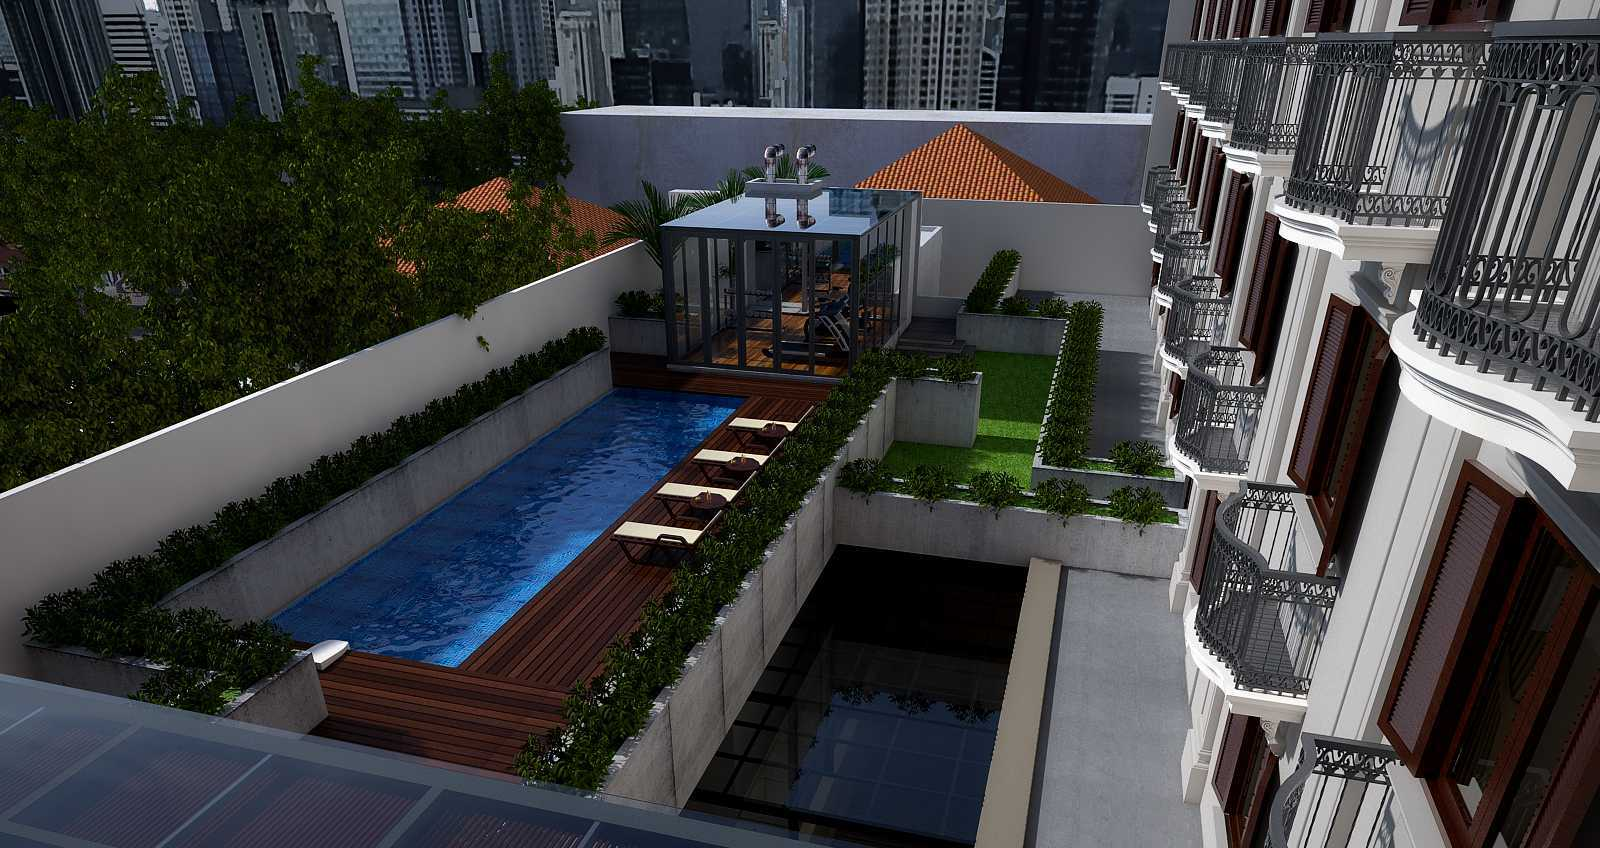 Pt. Garisprada Des Indes Hotel Menteng, Central Jakarta City, Jakarta, Indonesia Menteng Pool View Kontemporer  22609